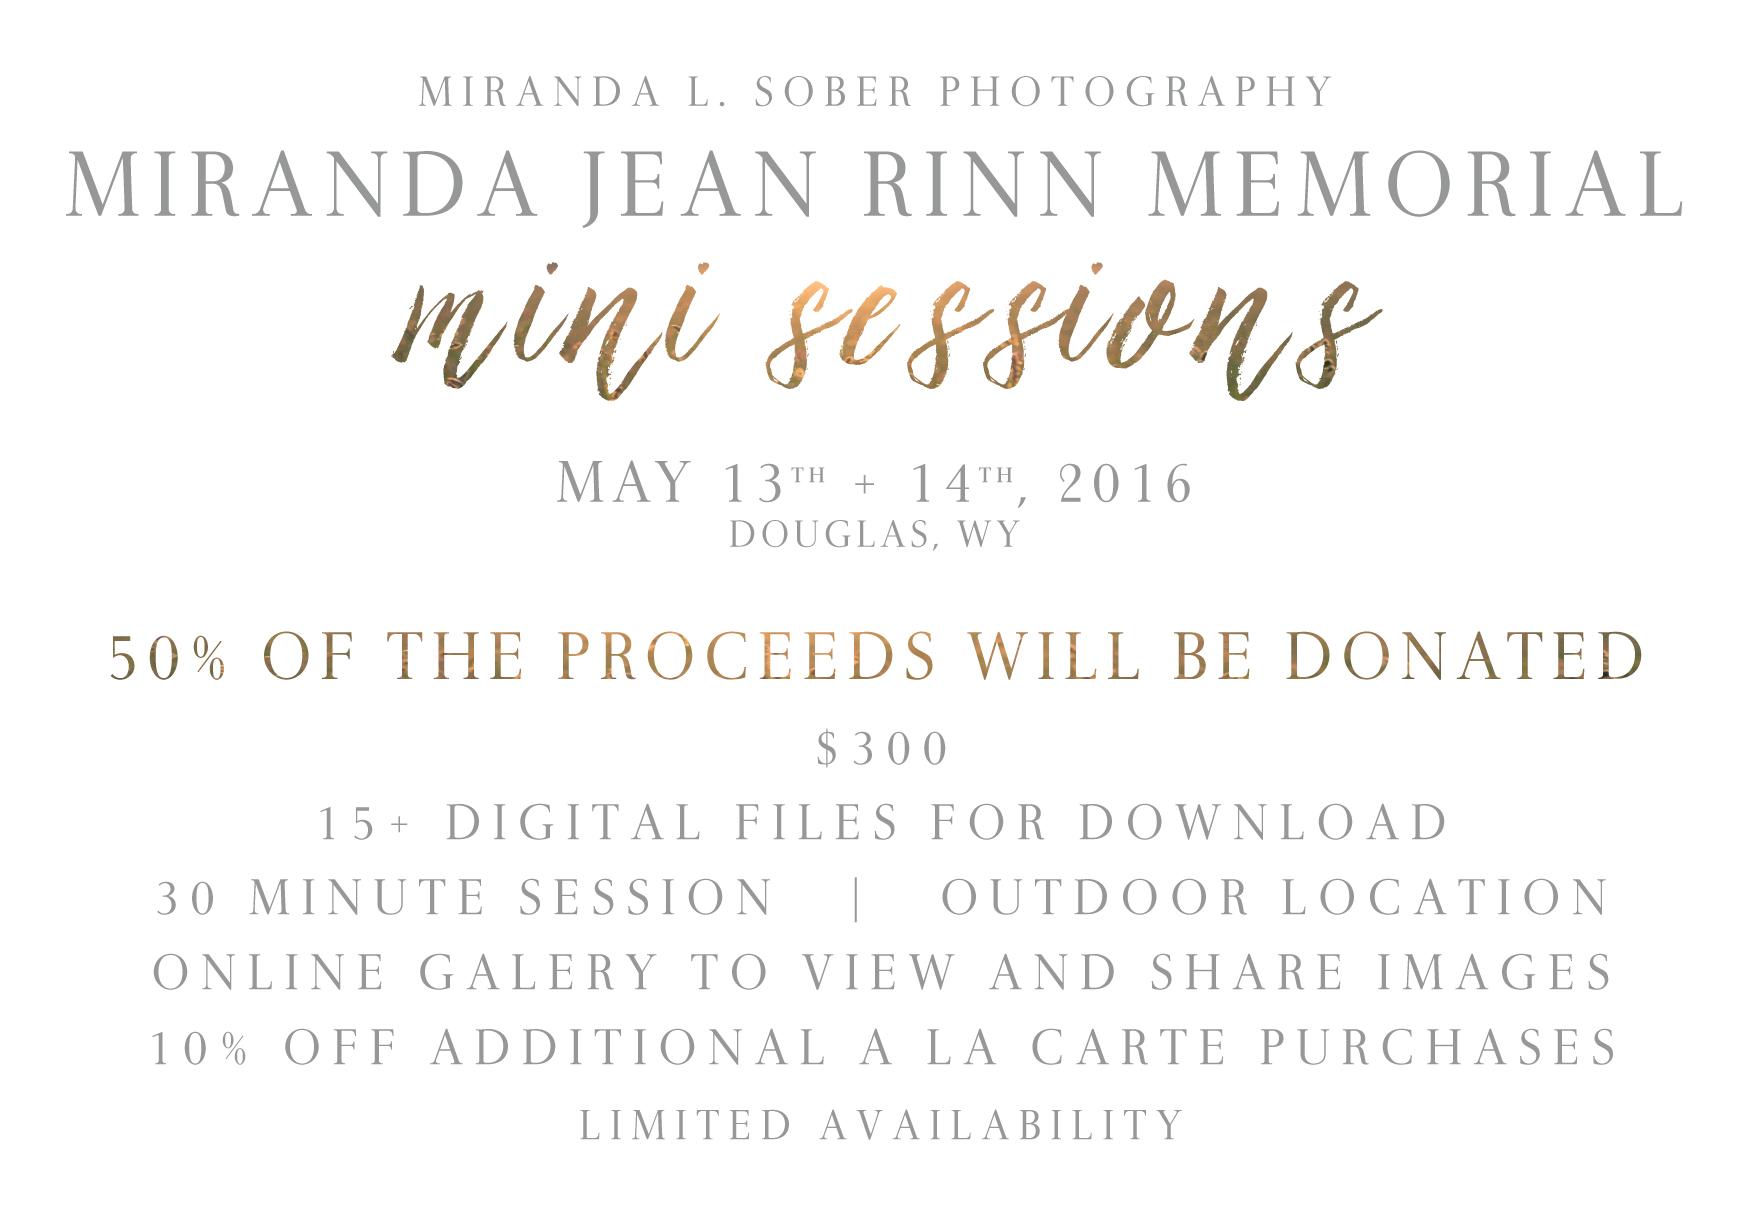 Photography Donation, Miranda L. Sober Photography Mini Sessions